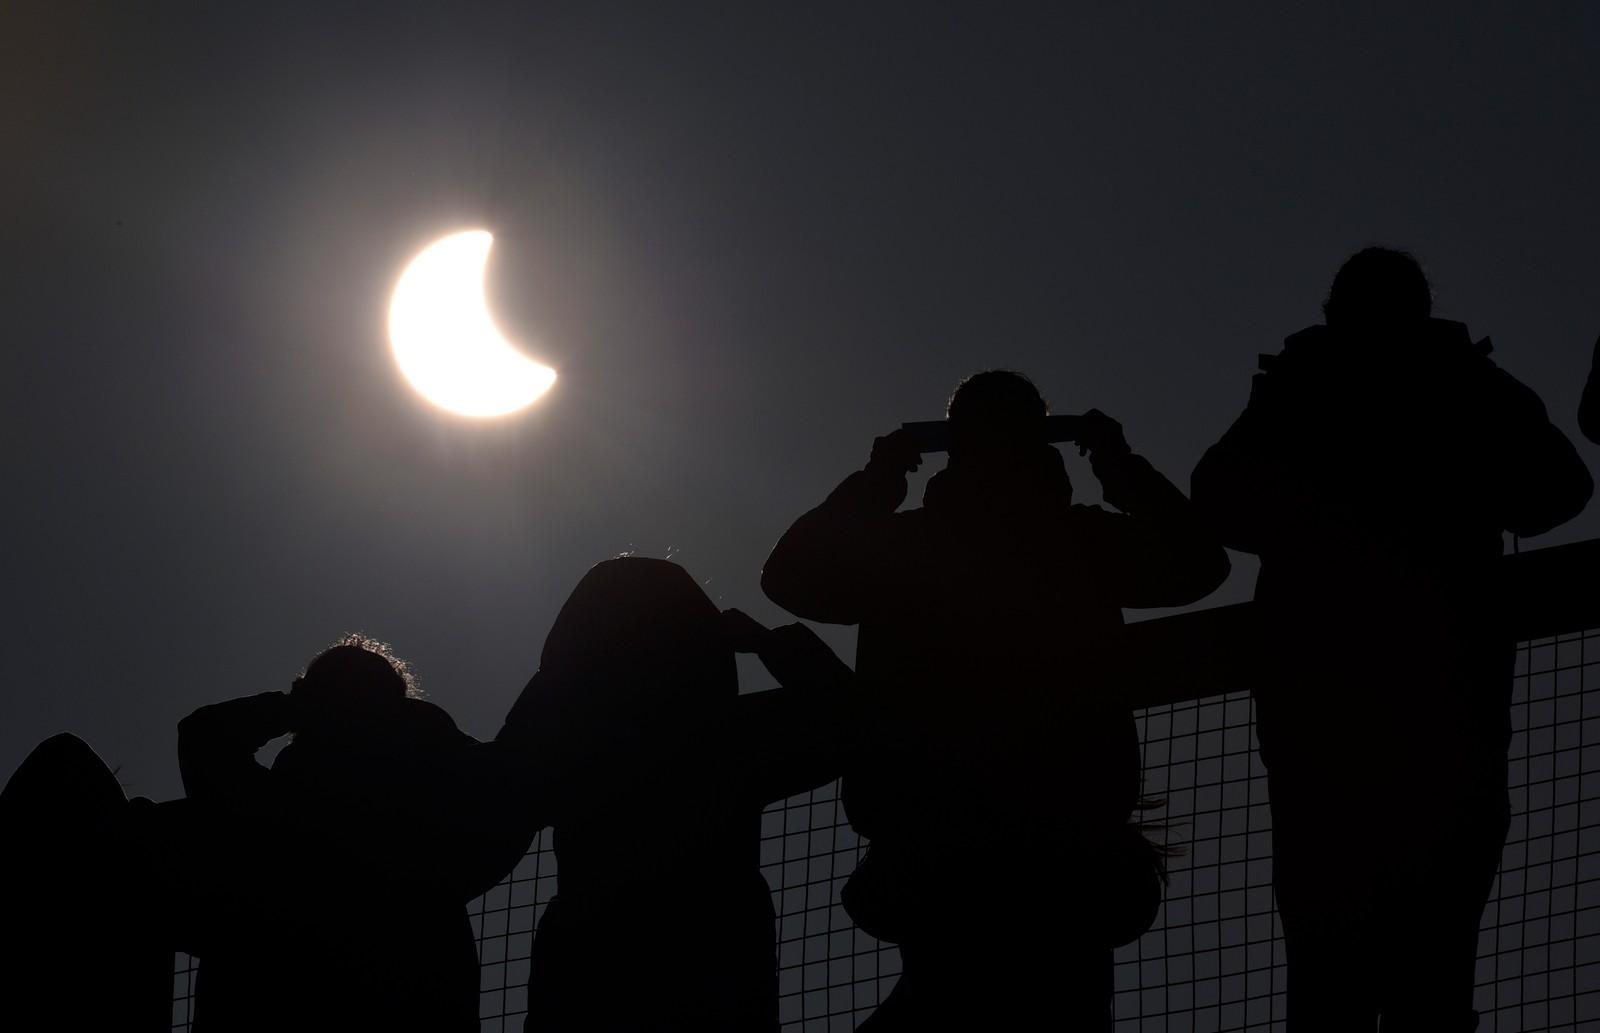 Folk ser mot sola i St. Austell, Cornwall i England.